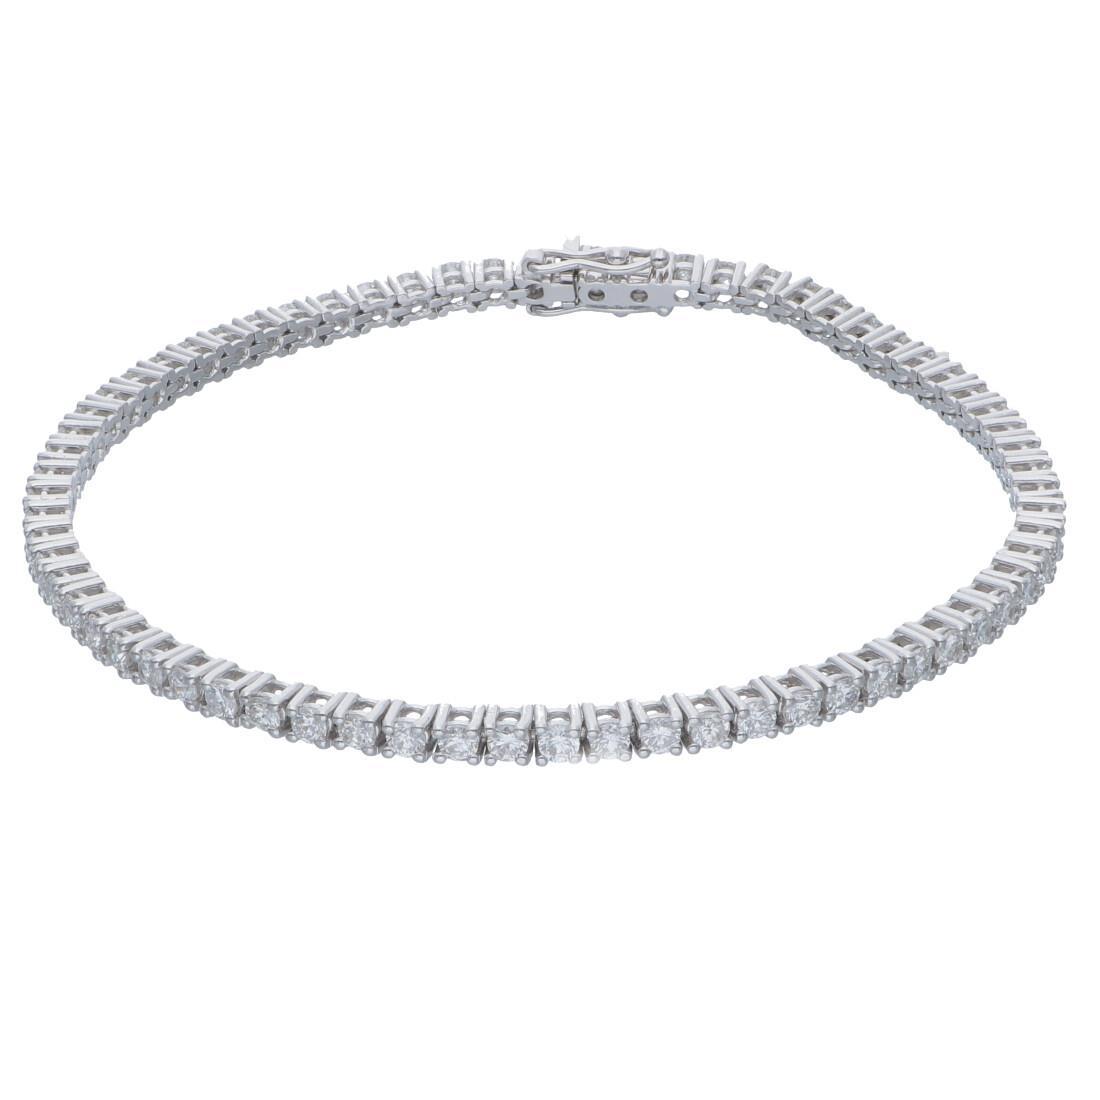 Tennis bracelet with diamonds ct 2,62 - ALFIERI & ST. JOHN